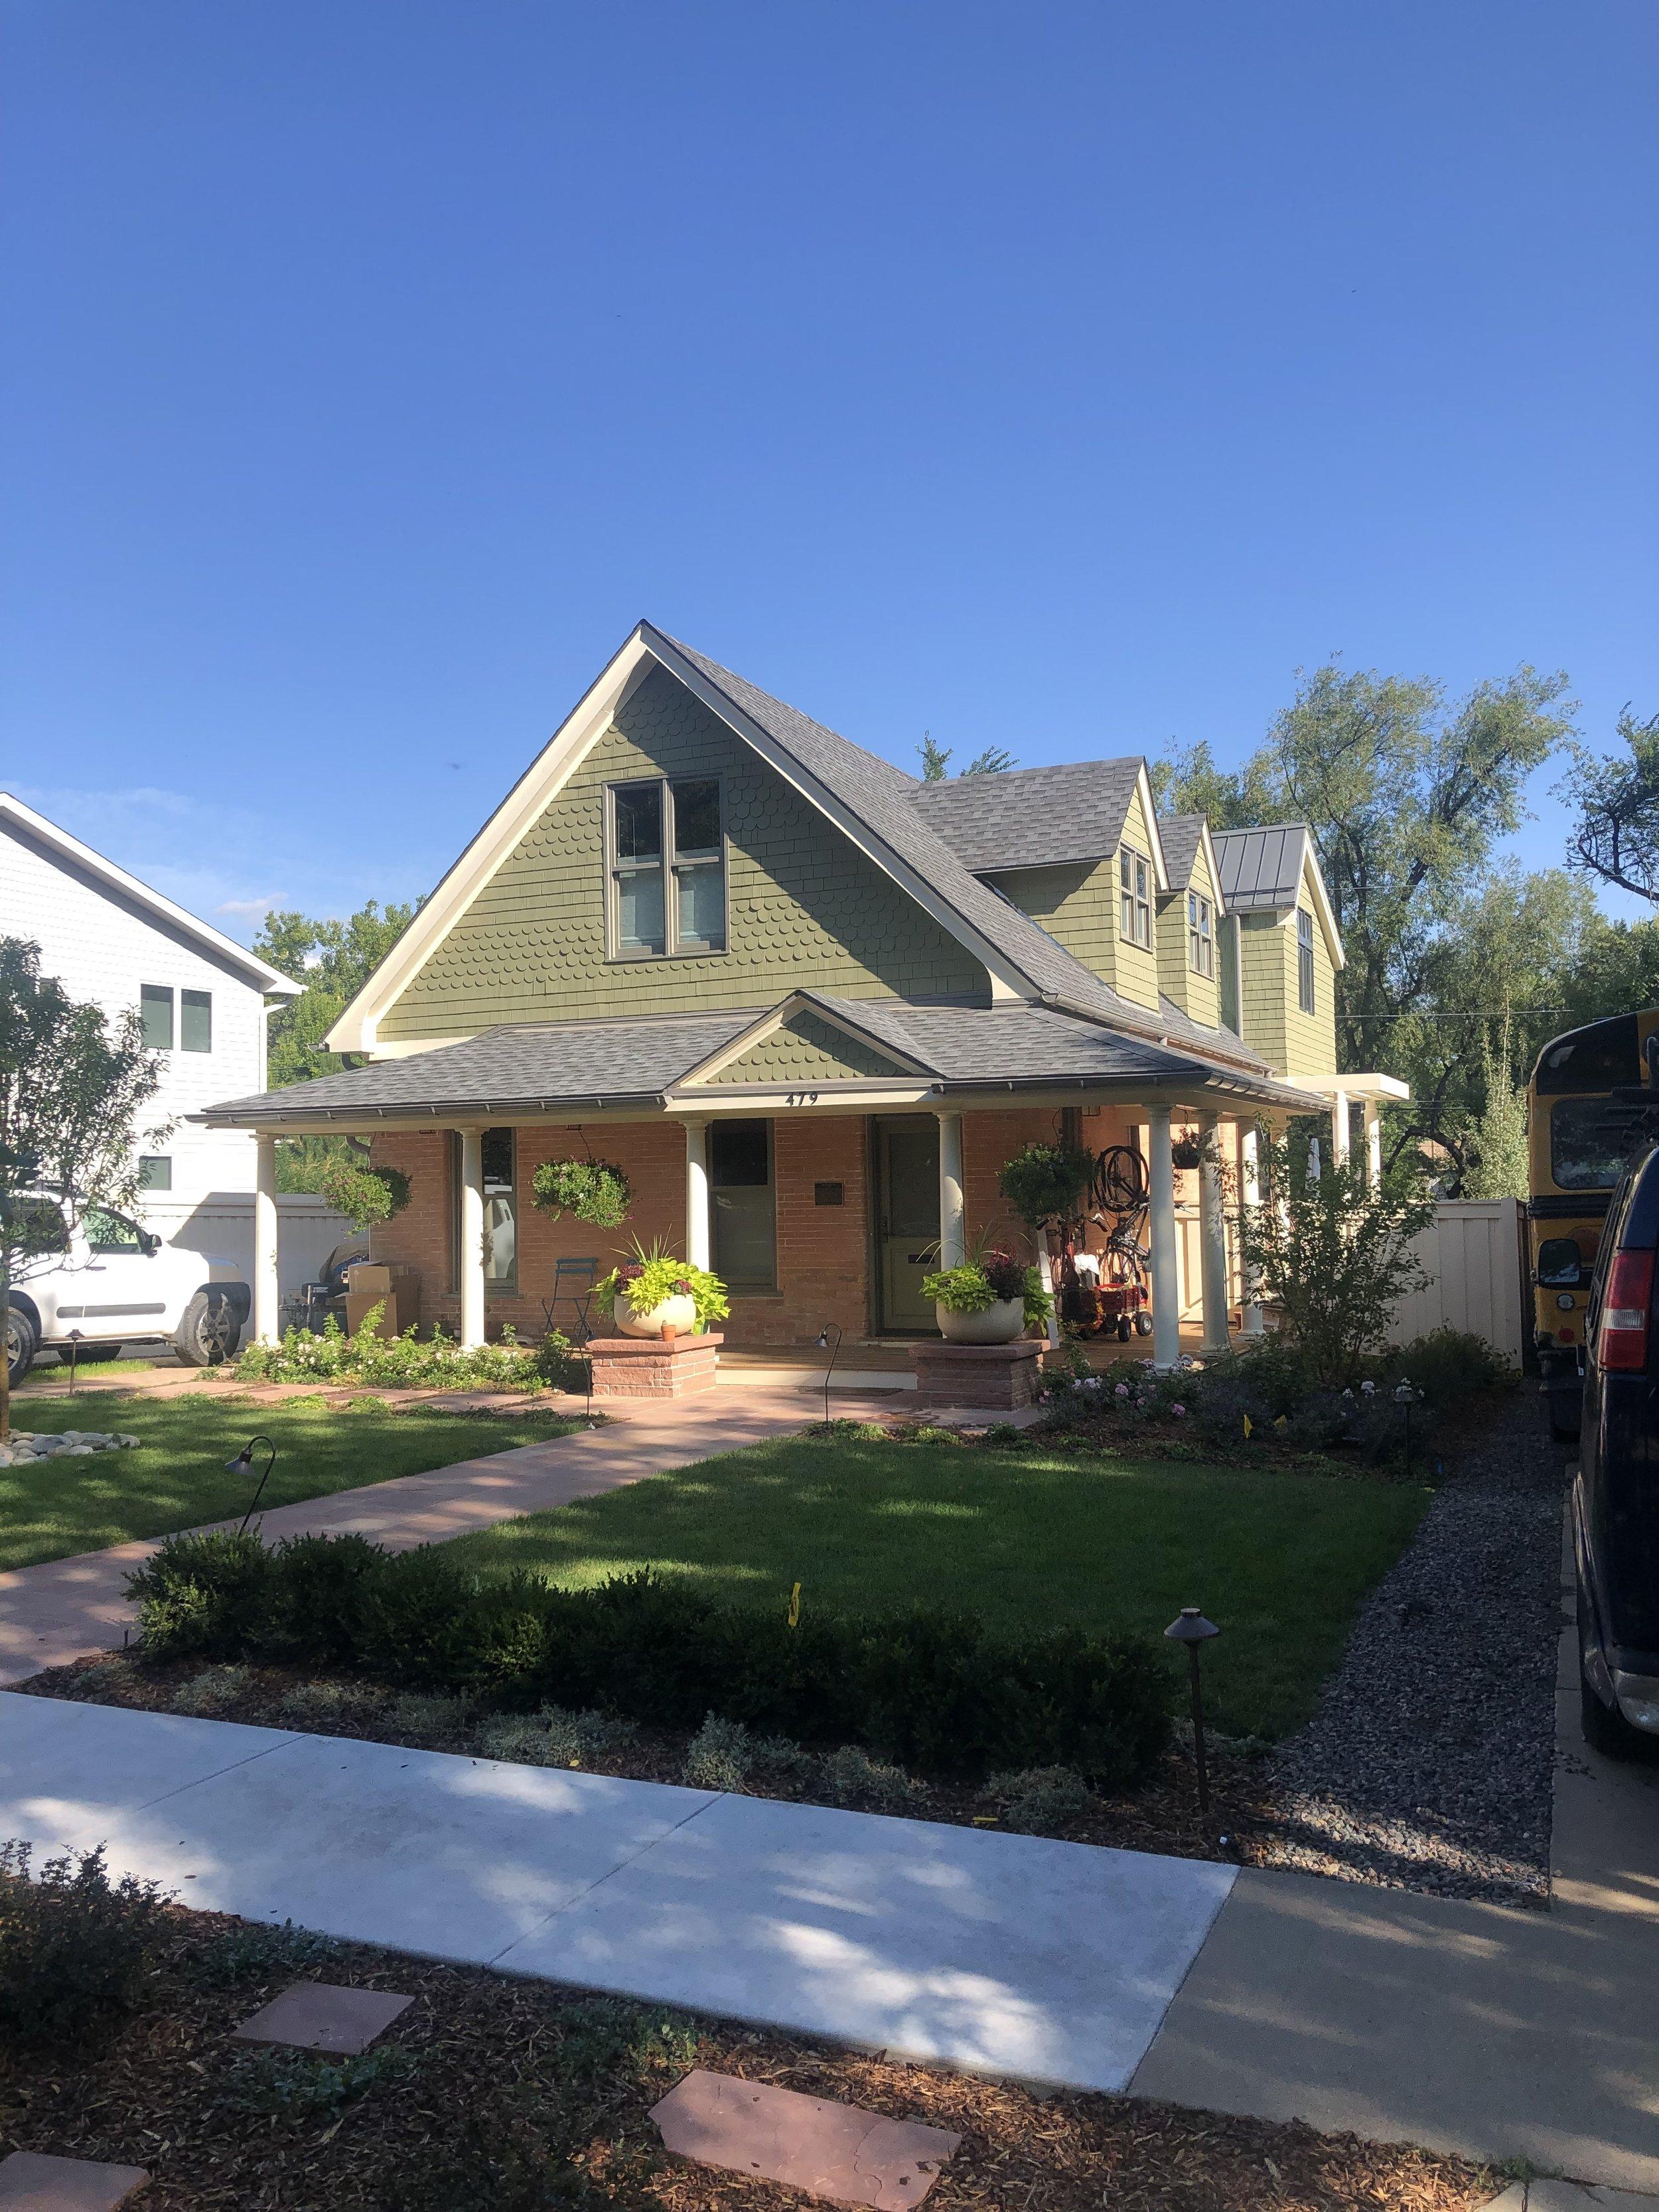 West Arapahoe Residence